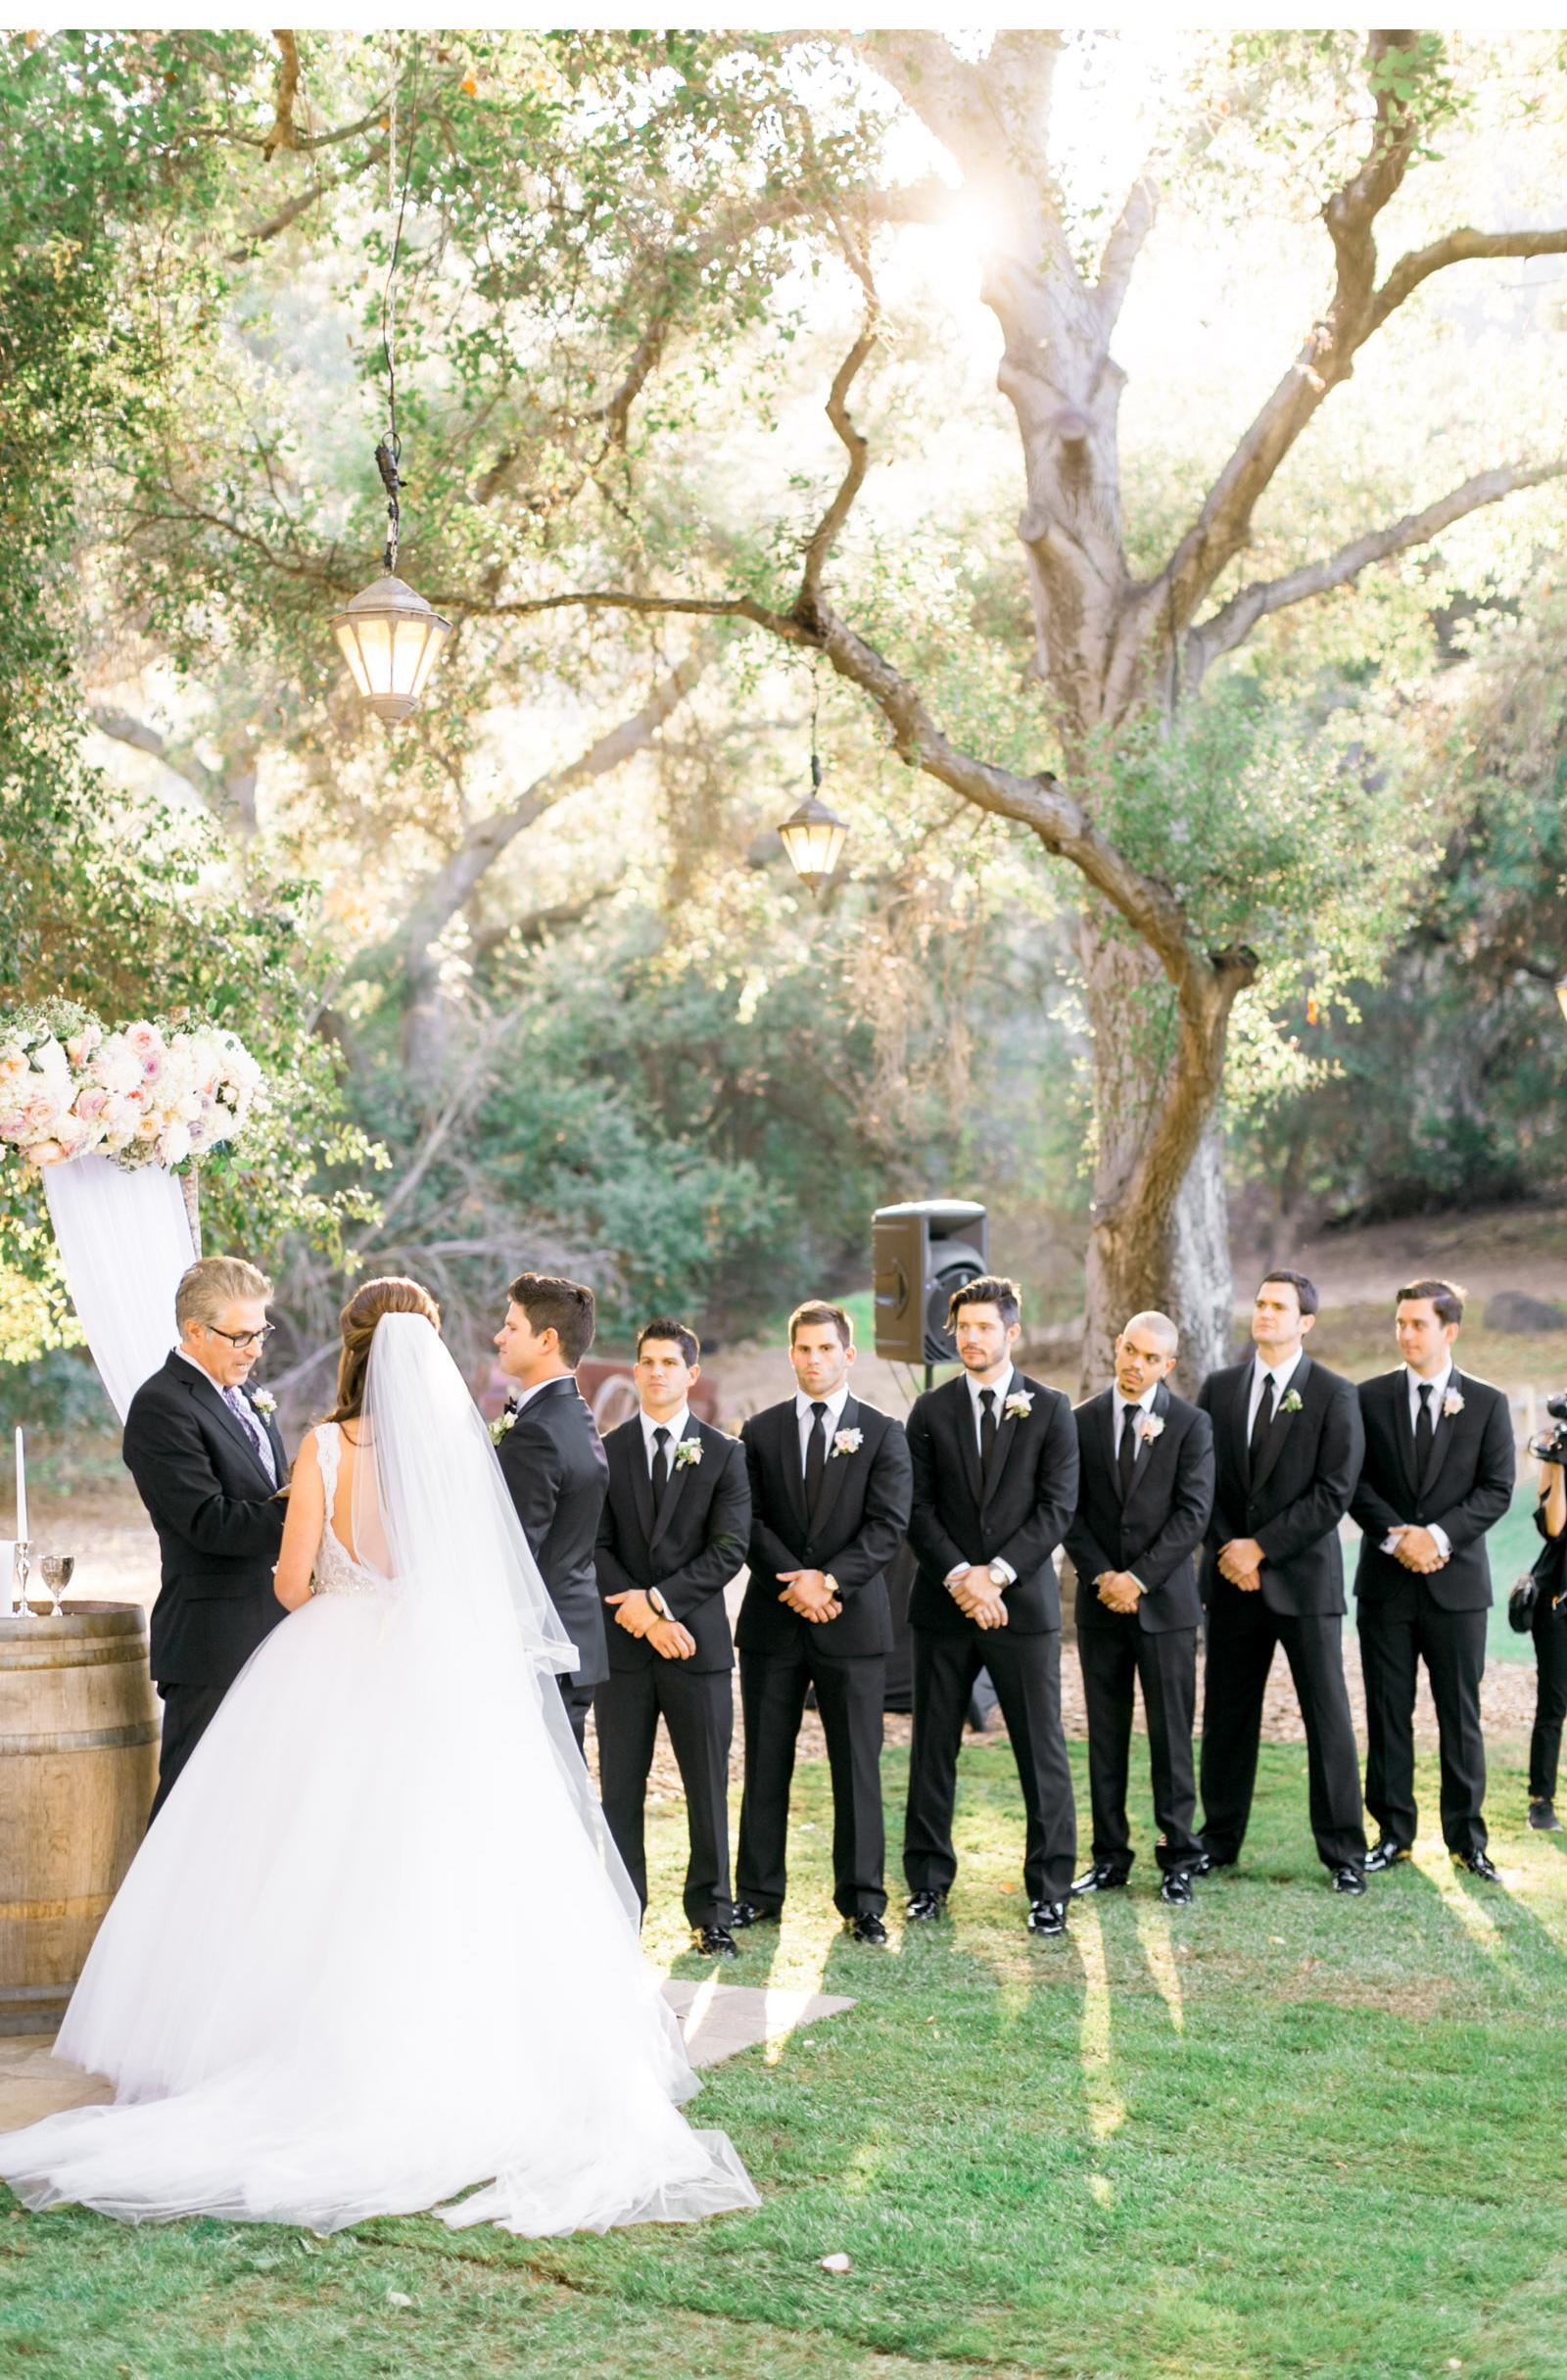 Temecula-Wedding-Miss-USA-Nia-Booko-Natalie-Schutt-Photography_02.jpg